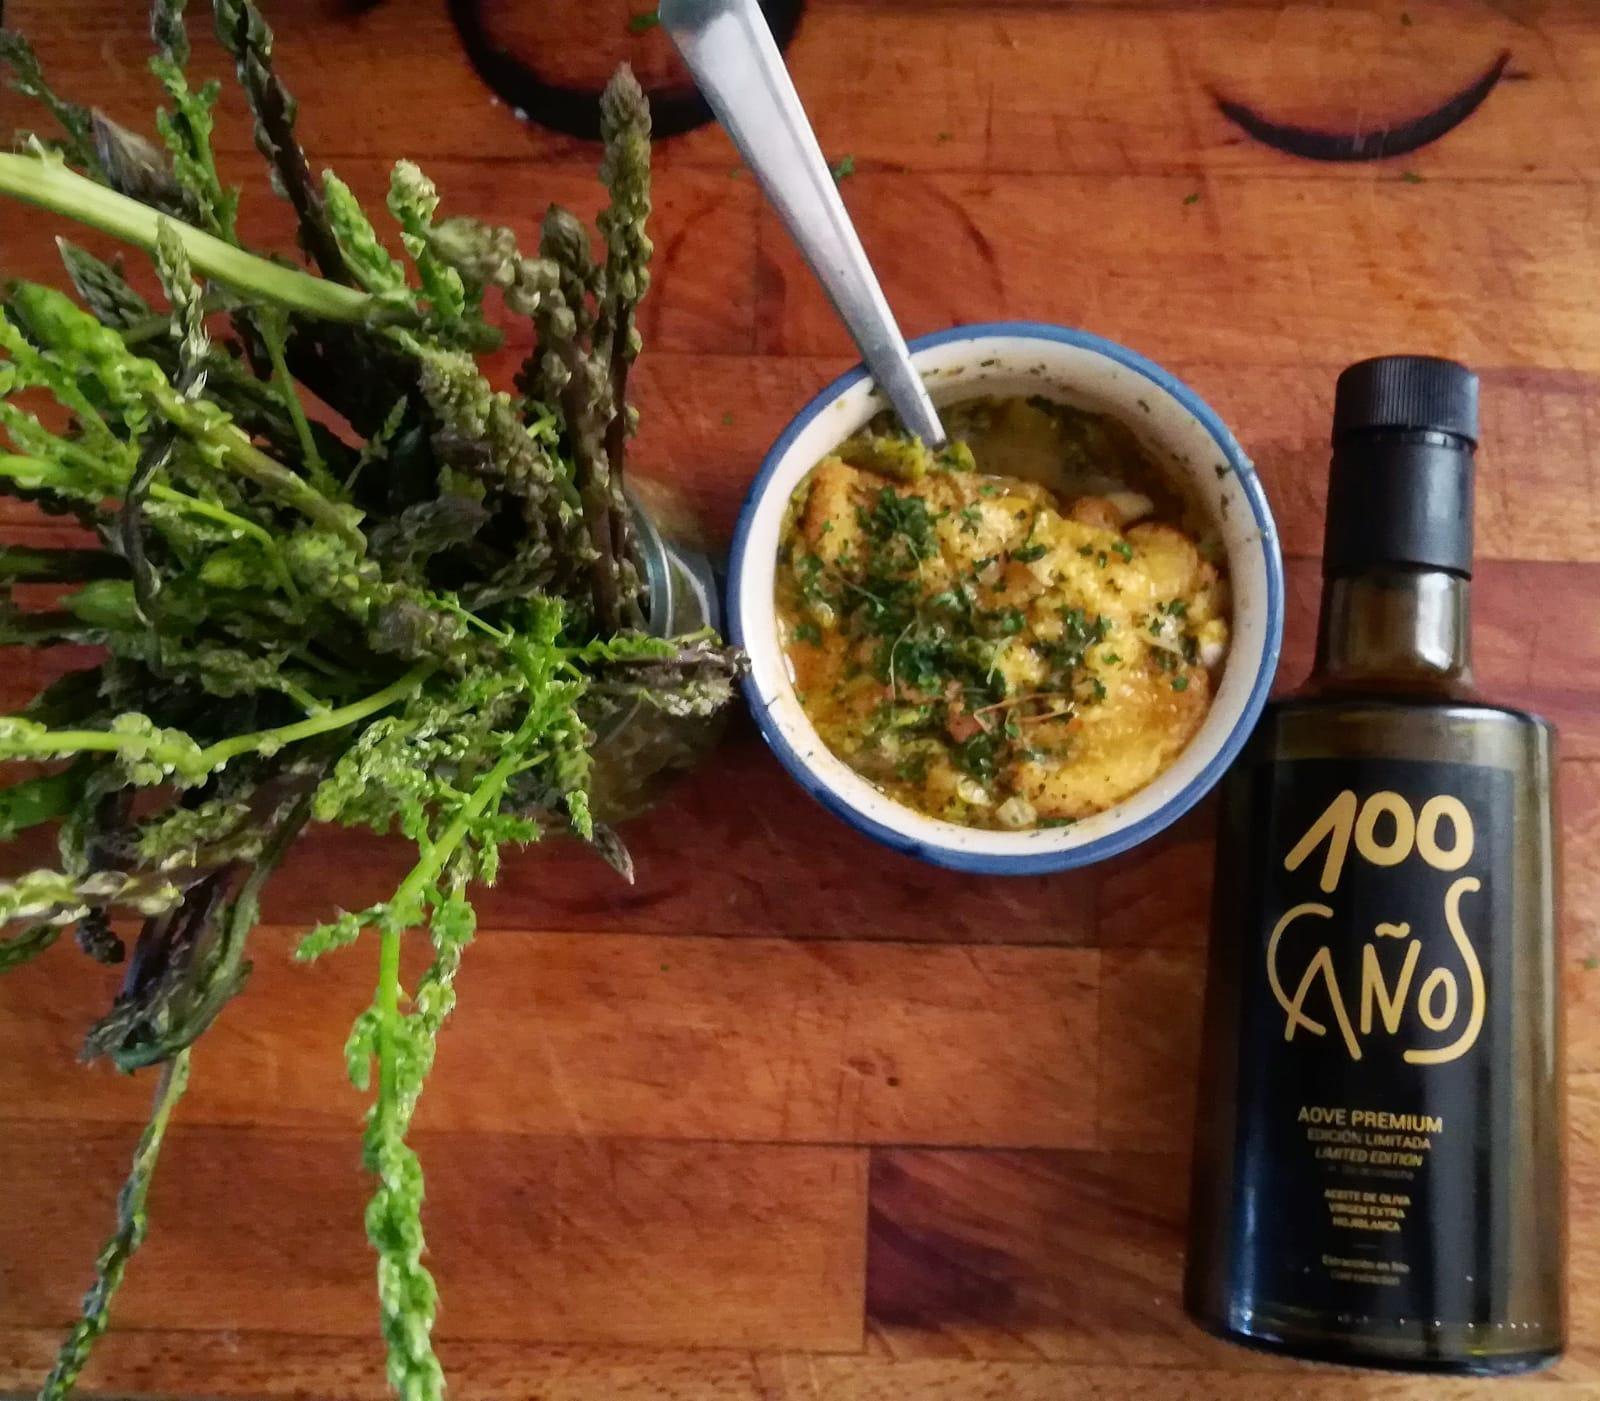 Gastronomía AOVE 100 Caños